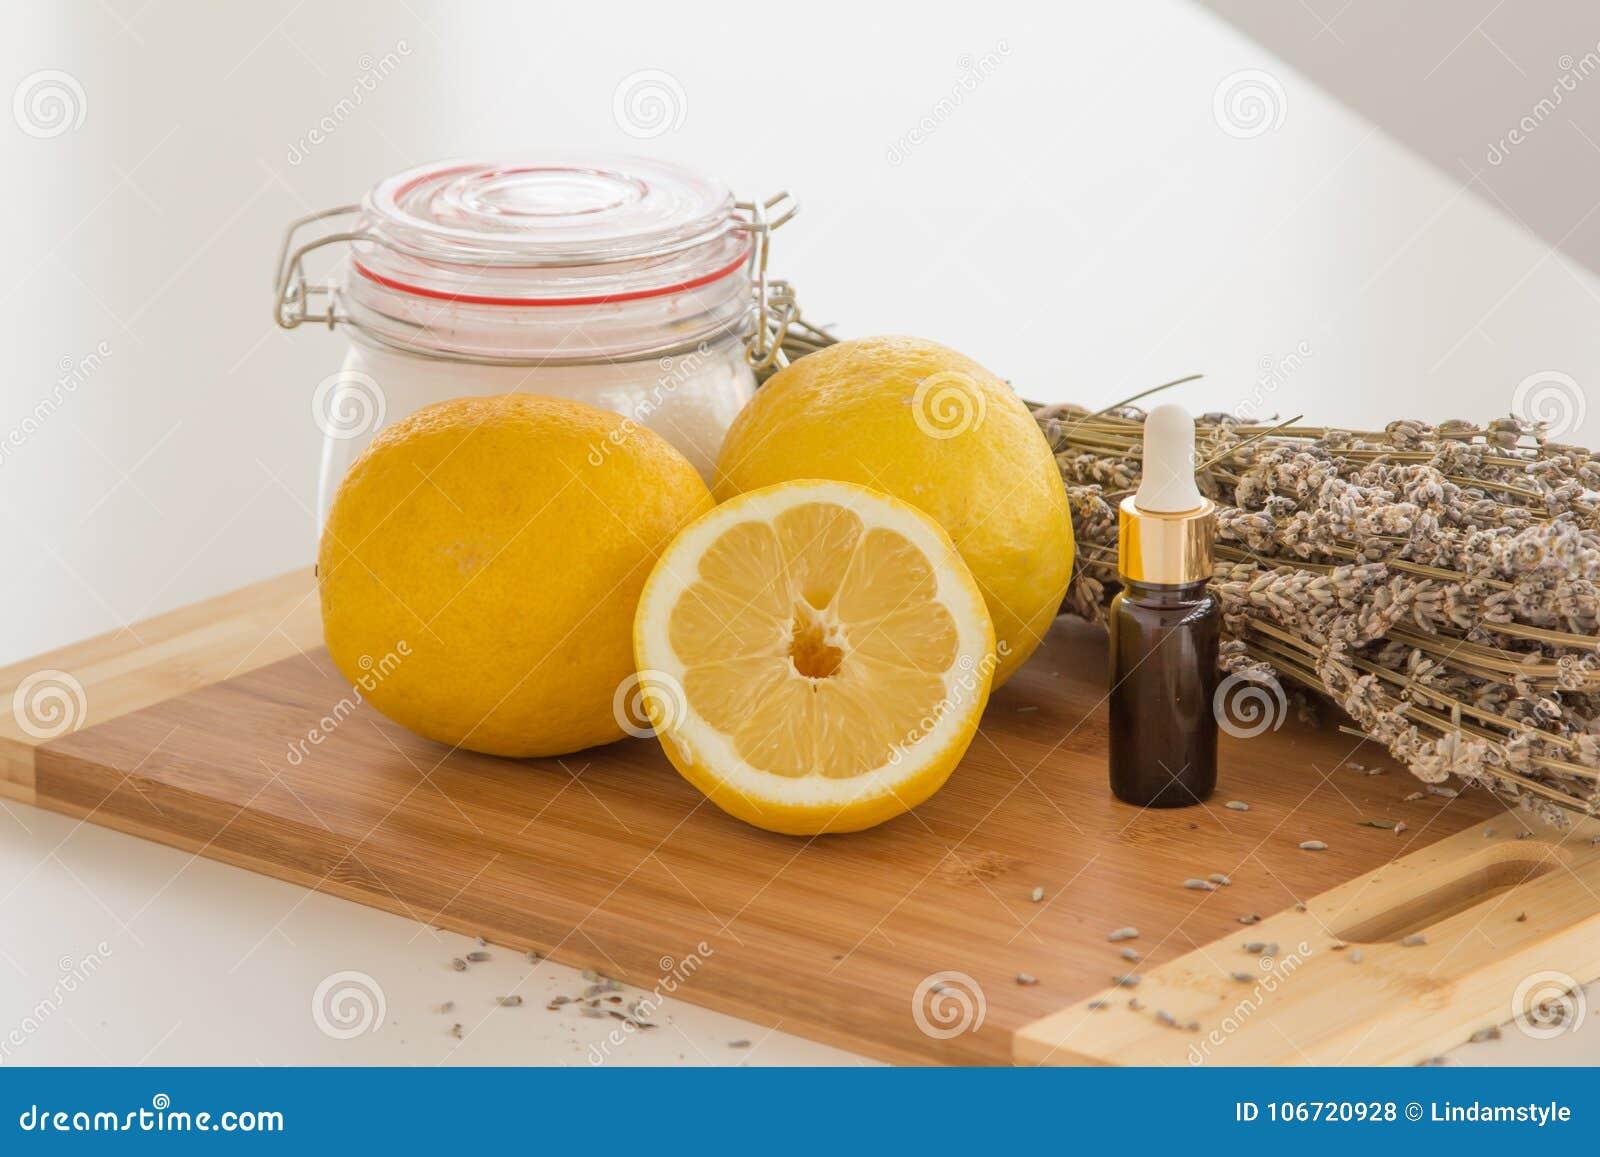 Lavender And Lemon Bath Salt Set Stock Photo - Image of